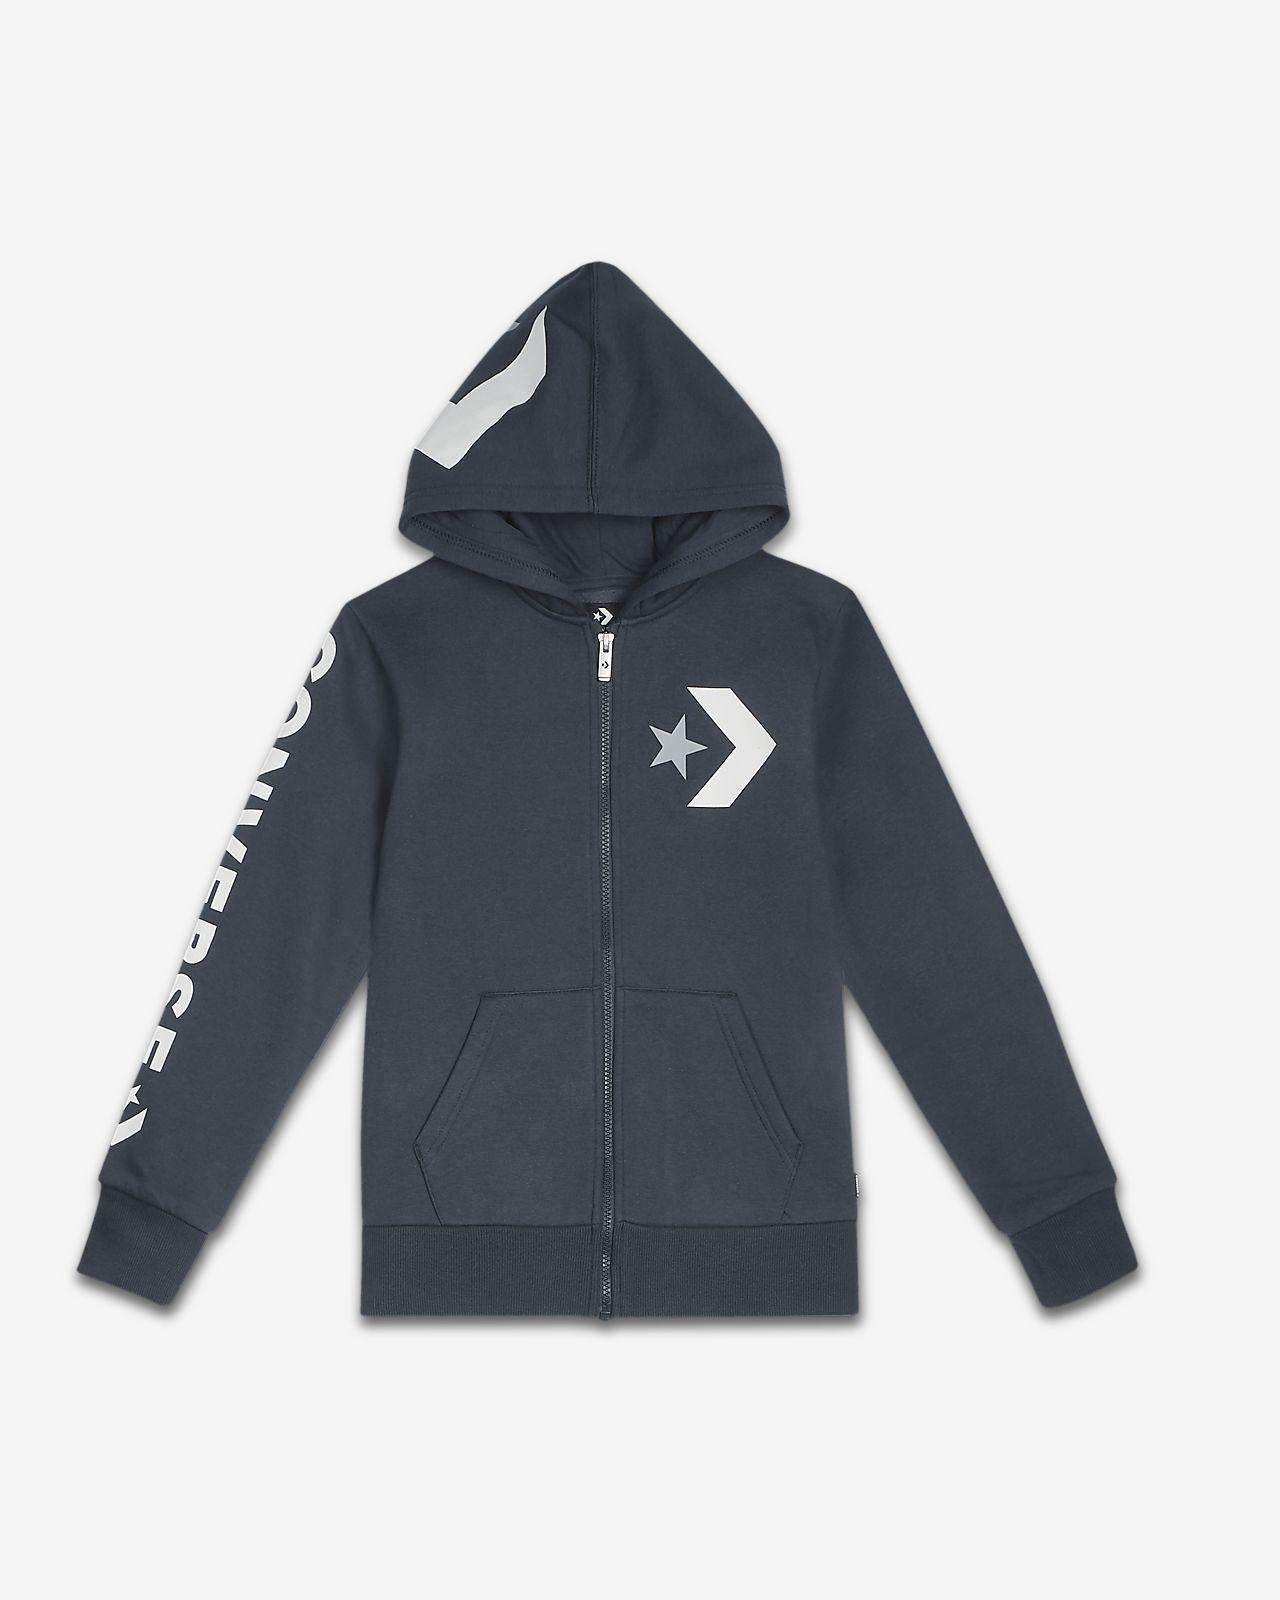 Converse Star Chevron Big Kids' (Boys') Fleece Full-Zip Hoodie